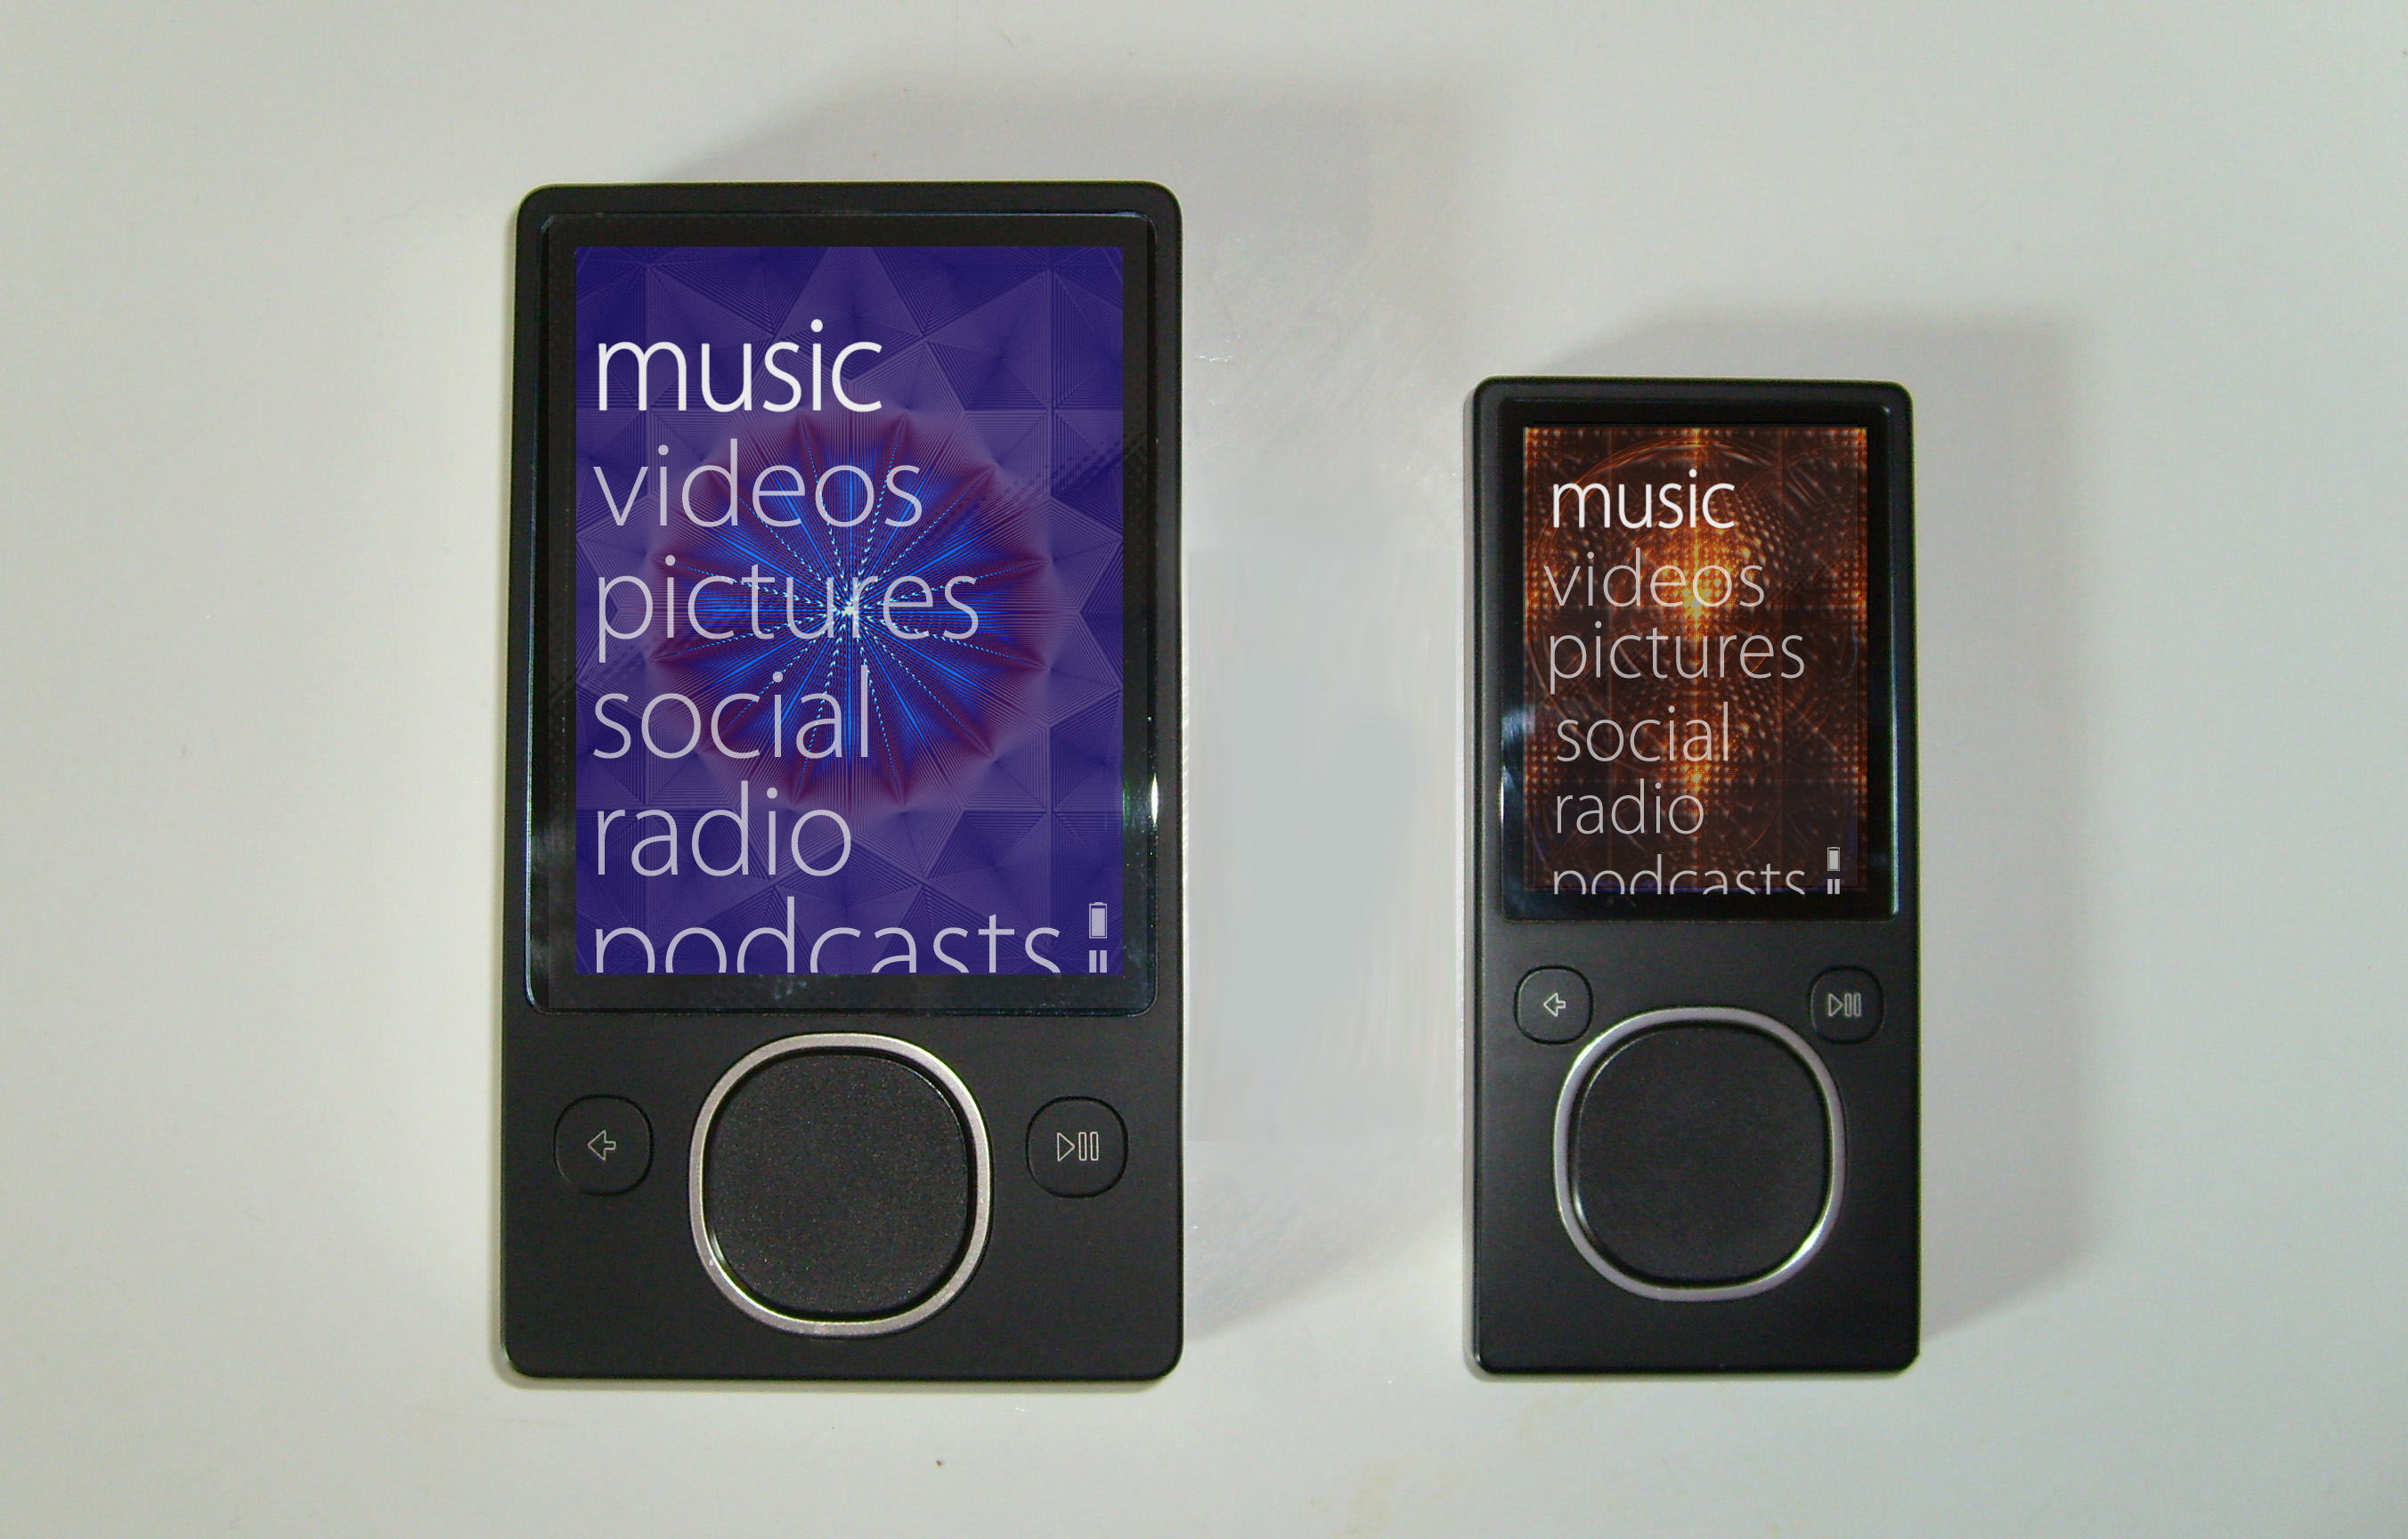 Microsoft zune wireless music player the register - Microsoft Zune Wireless Music Player The Register 6